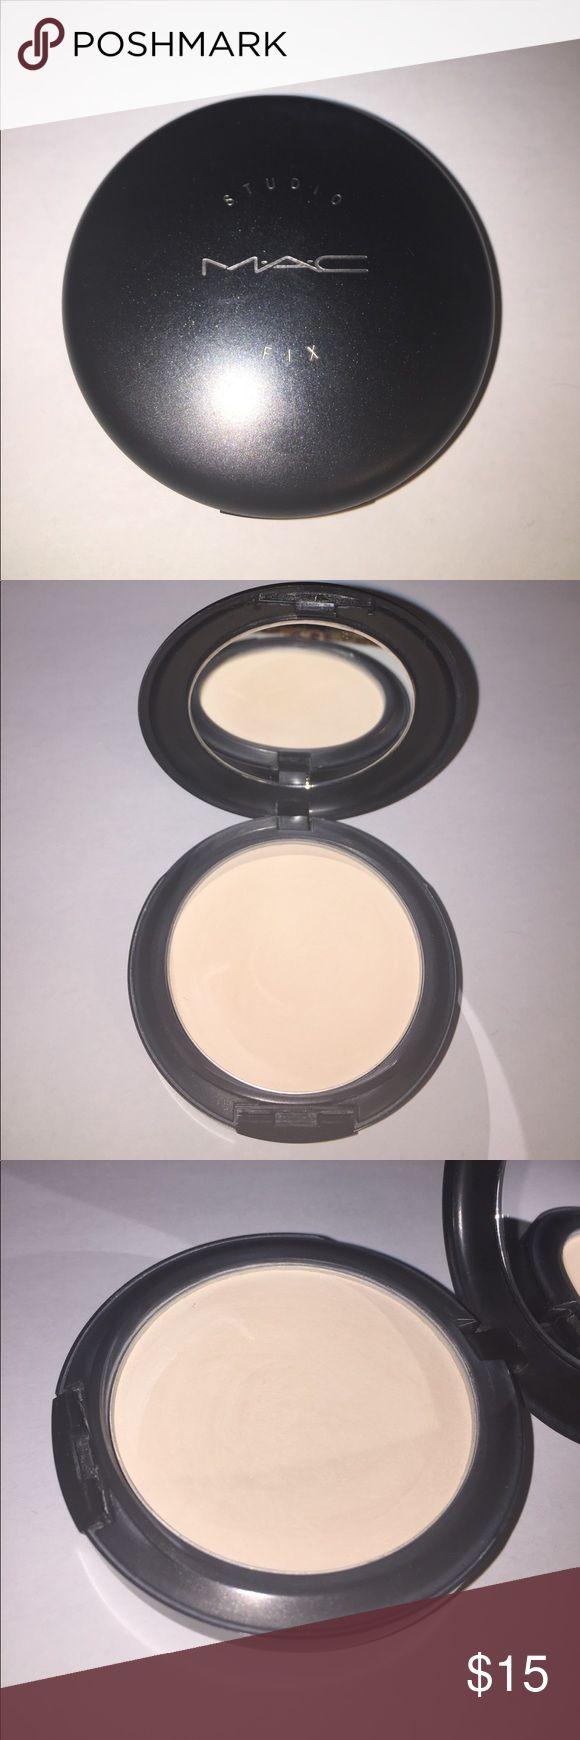 MAC COSMETICS STUDIO FIX Foundation Powder NW15 FIRM PRICE. No trades. Thanks! MAC COSMETICS STUDIO FIX Foundation Powder NW15. See pictures usage. A lot left. MAC Cosmetics Makeup Foundation